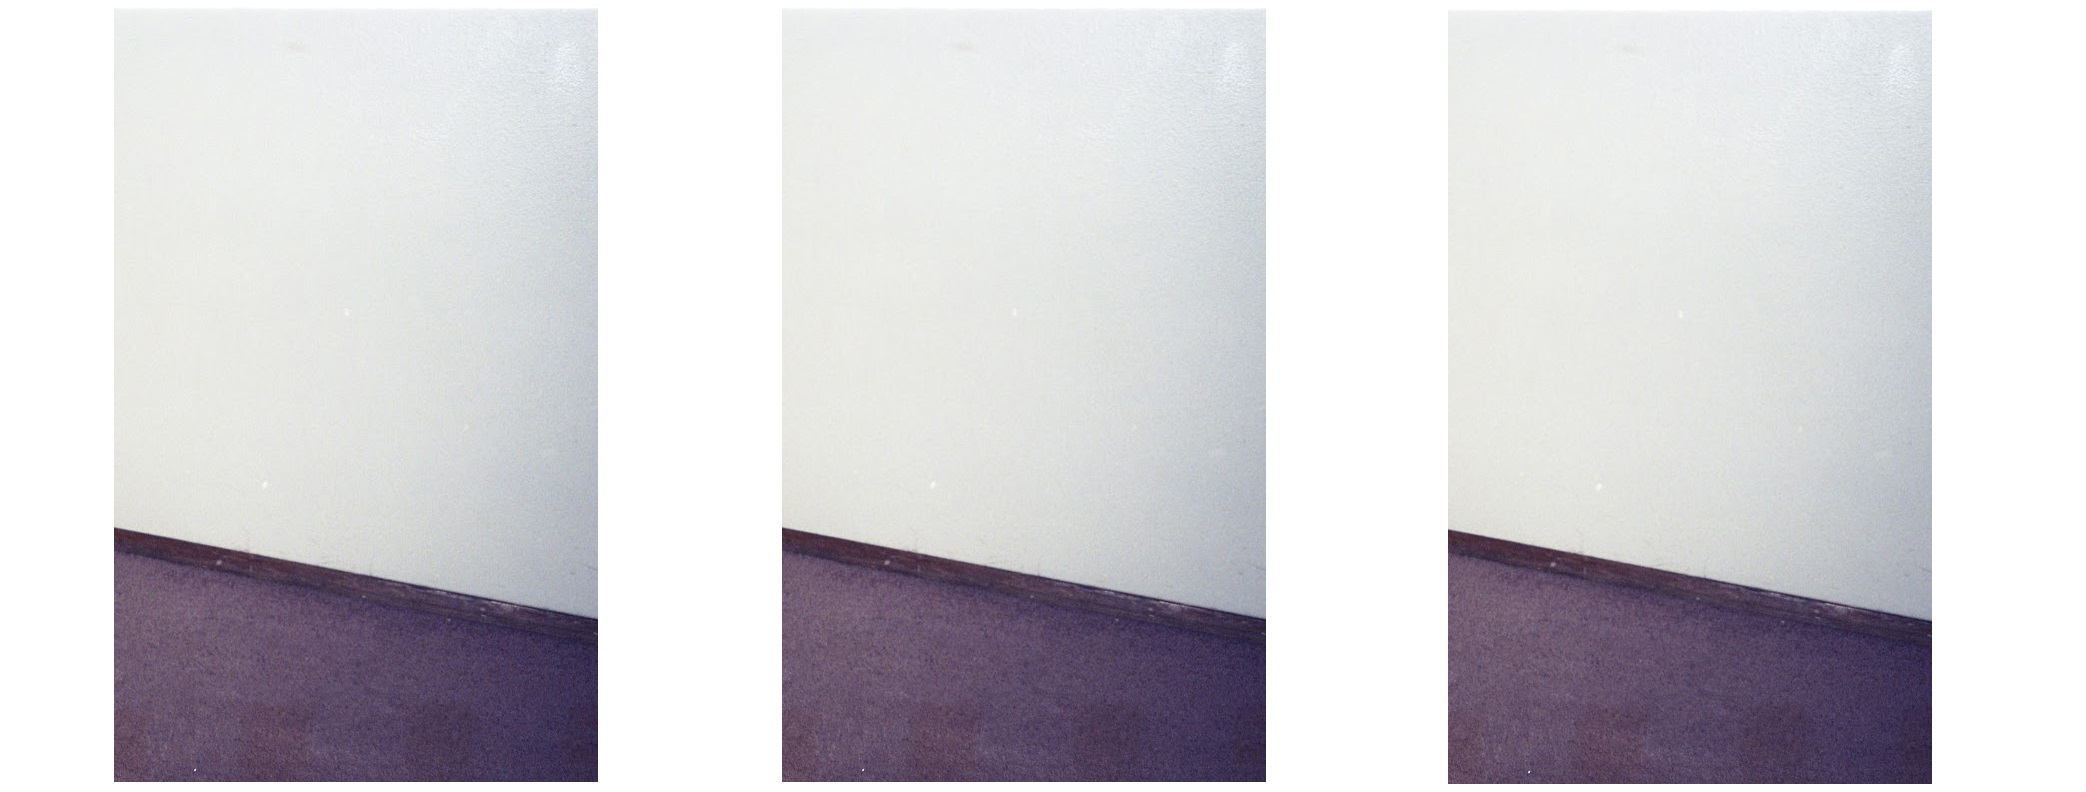 The Carpet (tripych)